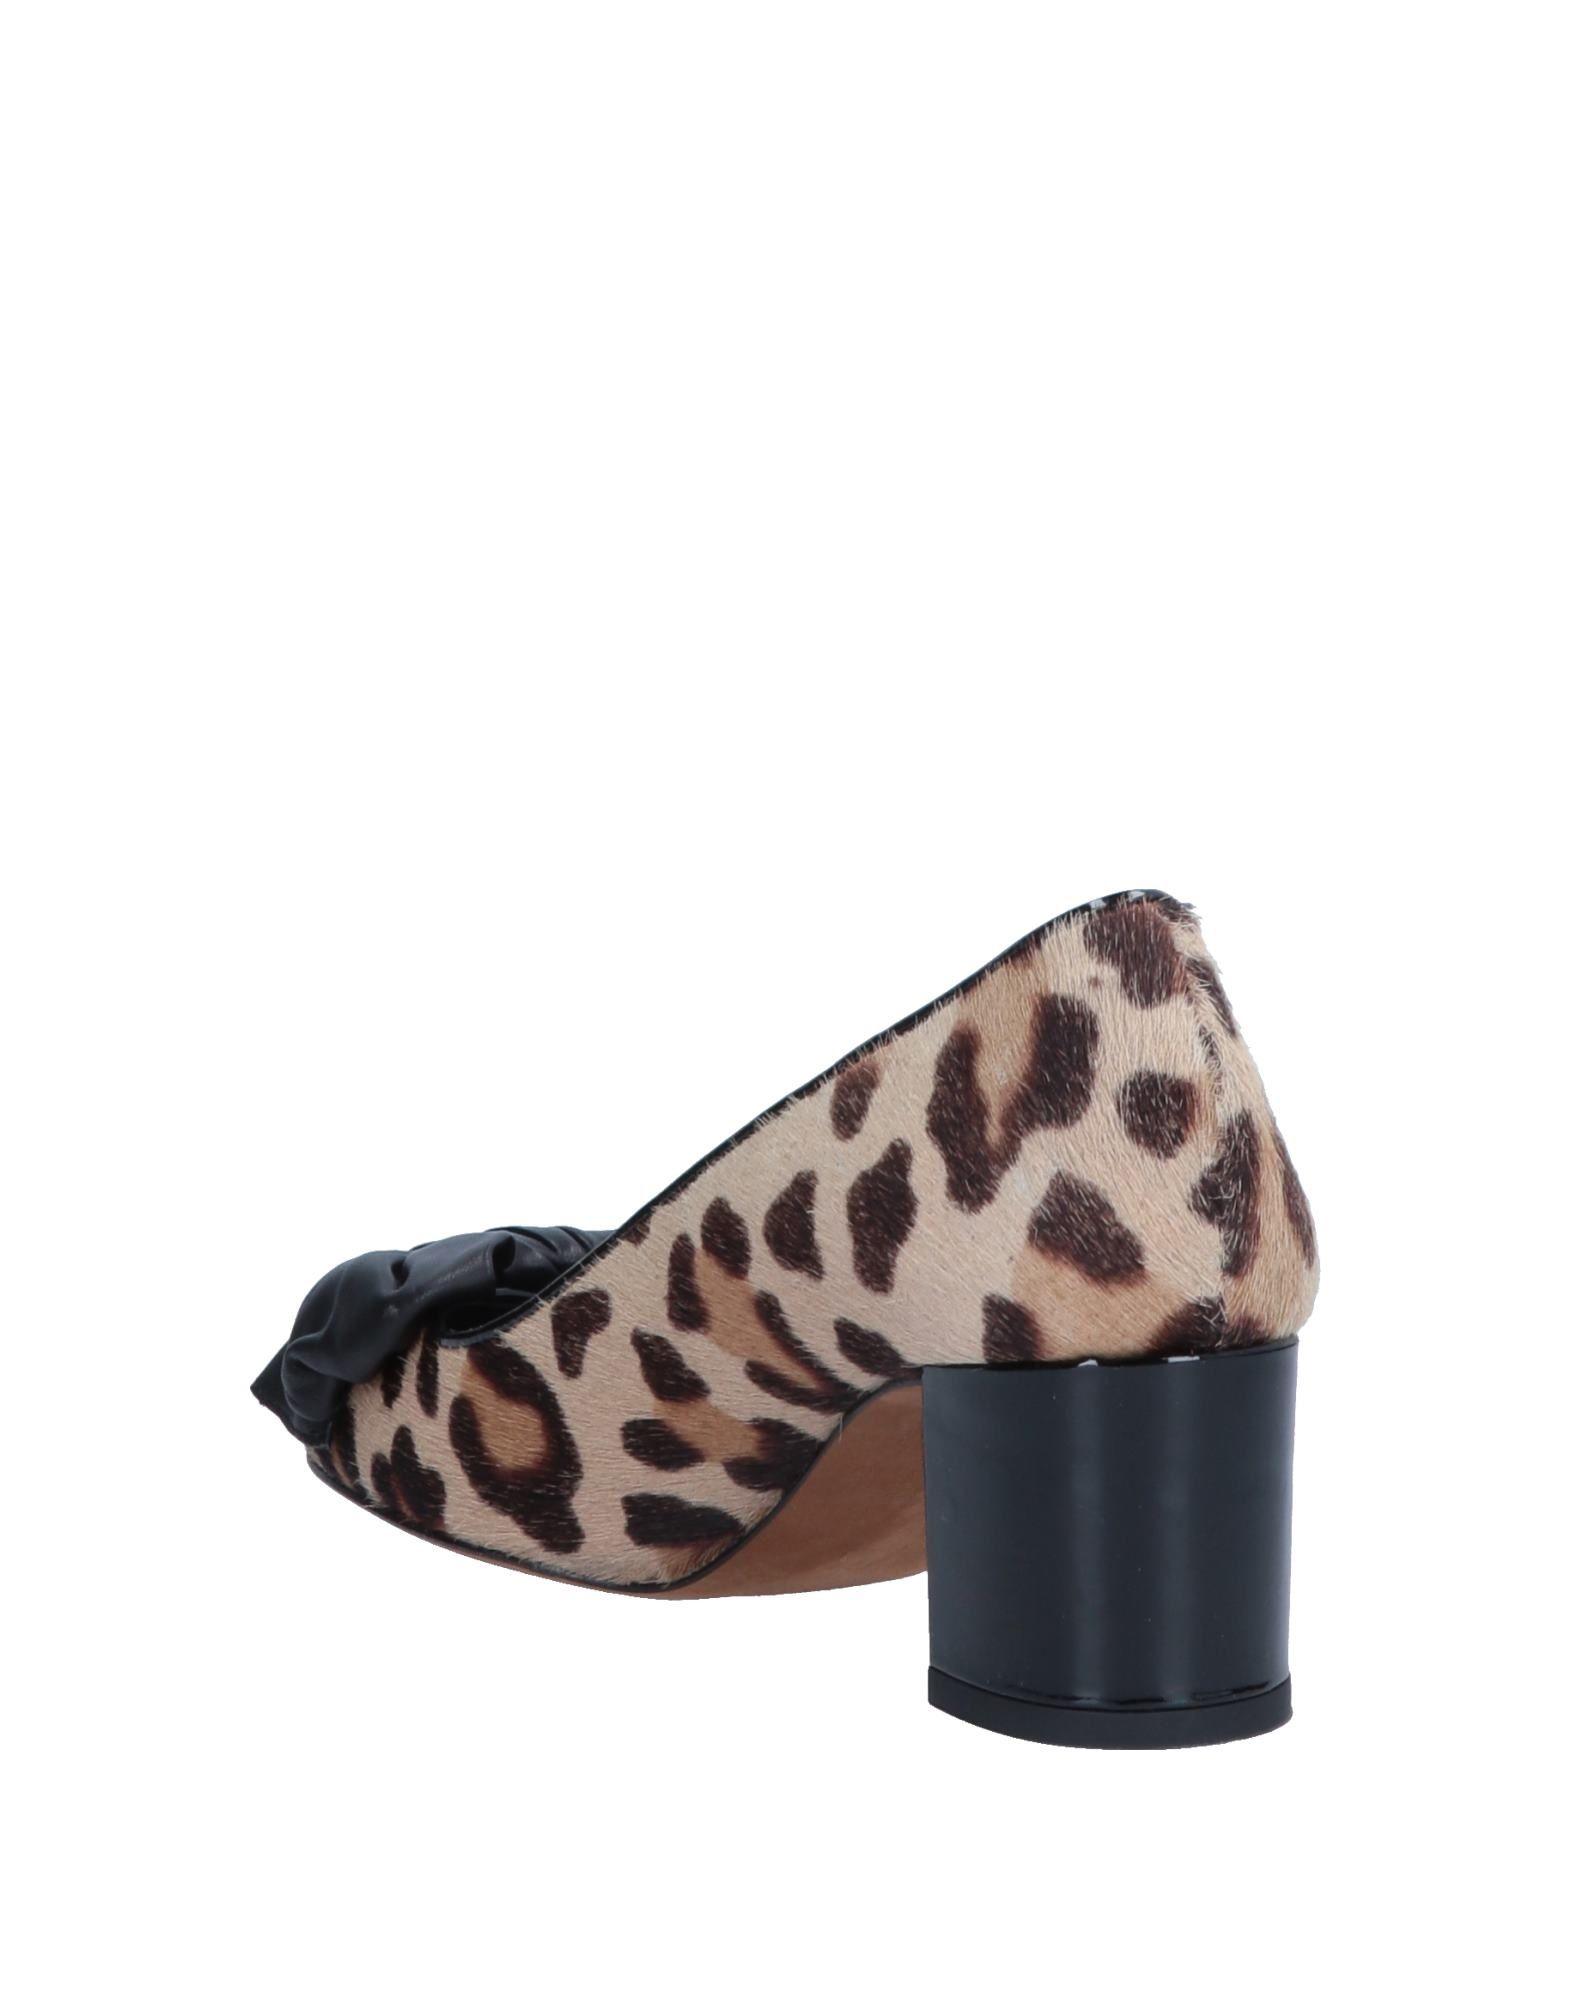 Moschino  Cheap And Chic Pumps Damen  Moschino 11566038EUGut aussehende strapazierfähige Schuhe f8a6de